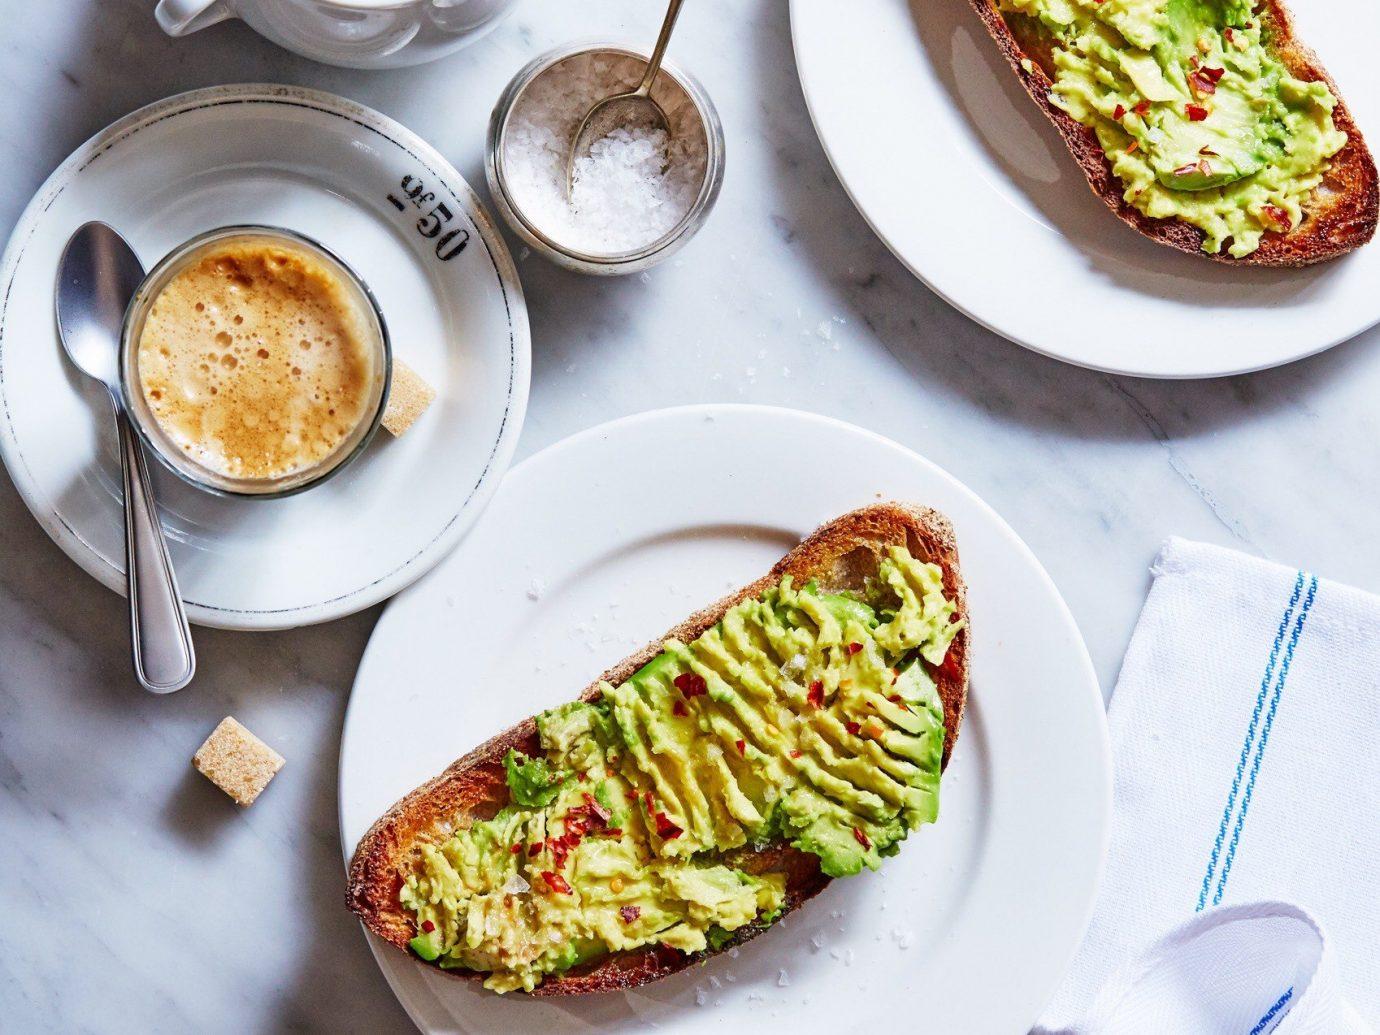 Food + Drink plate food dish produce meal breakfast vegetable land plant cuisine flowering plant meat